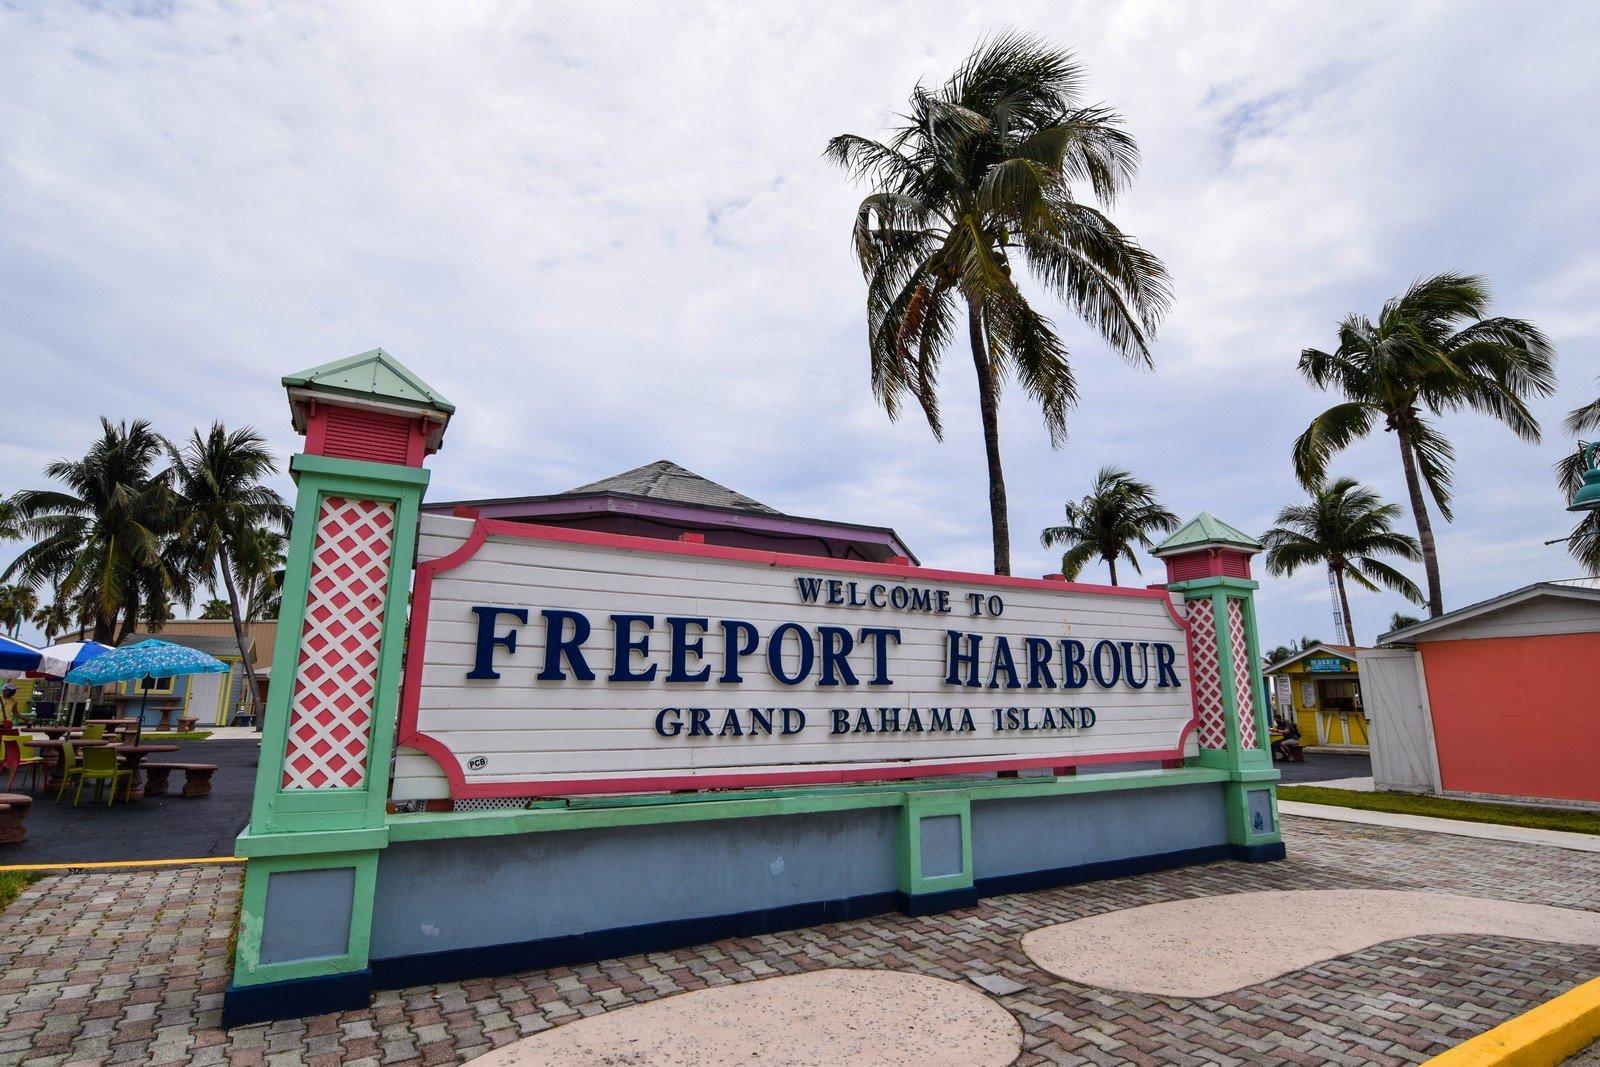 Adventure of the Seas Live Blog - Day 7 - Freeport